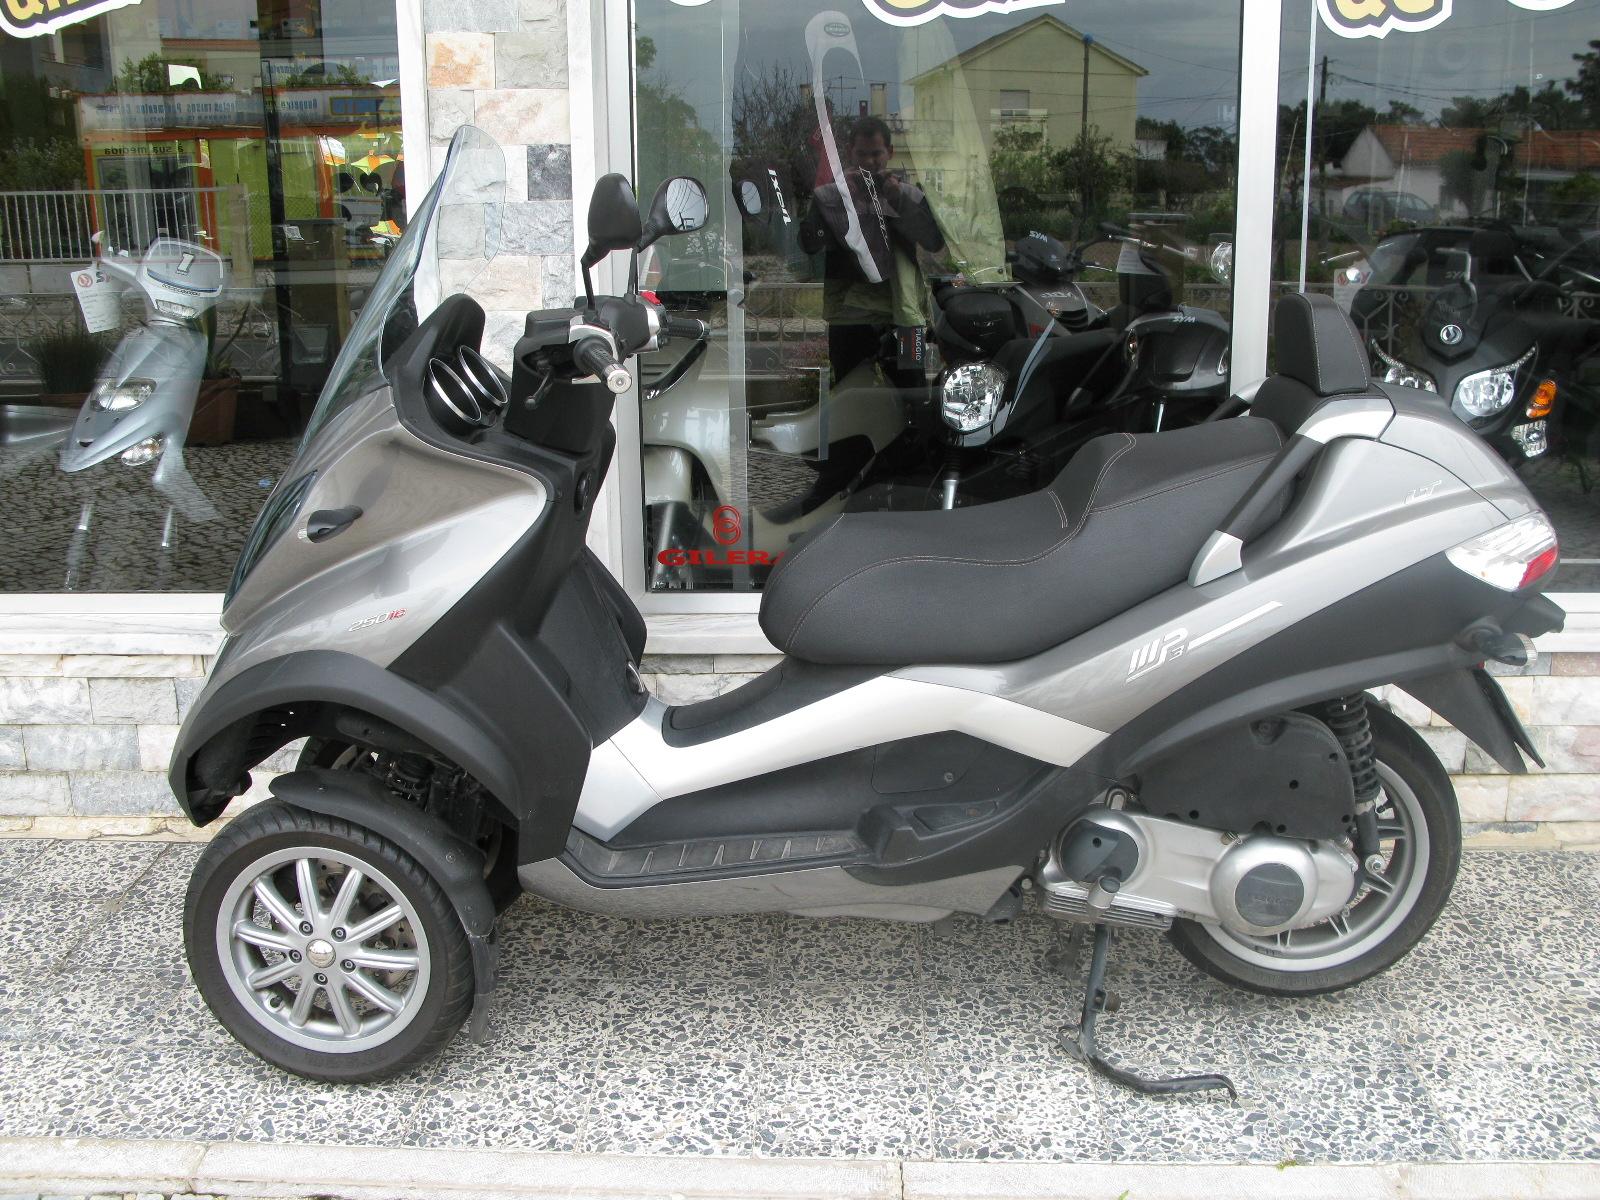 loja das motos piaggio mp3 250 lt usada. Black Bedroom Furniture Sets. Home Design Ideas